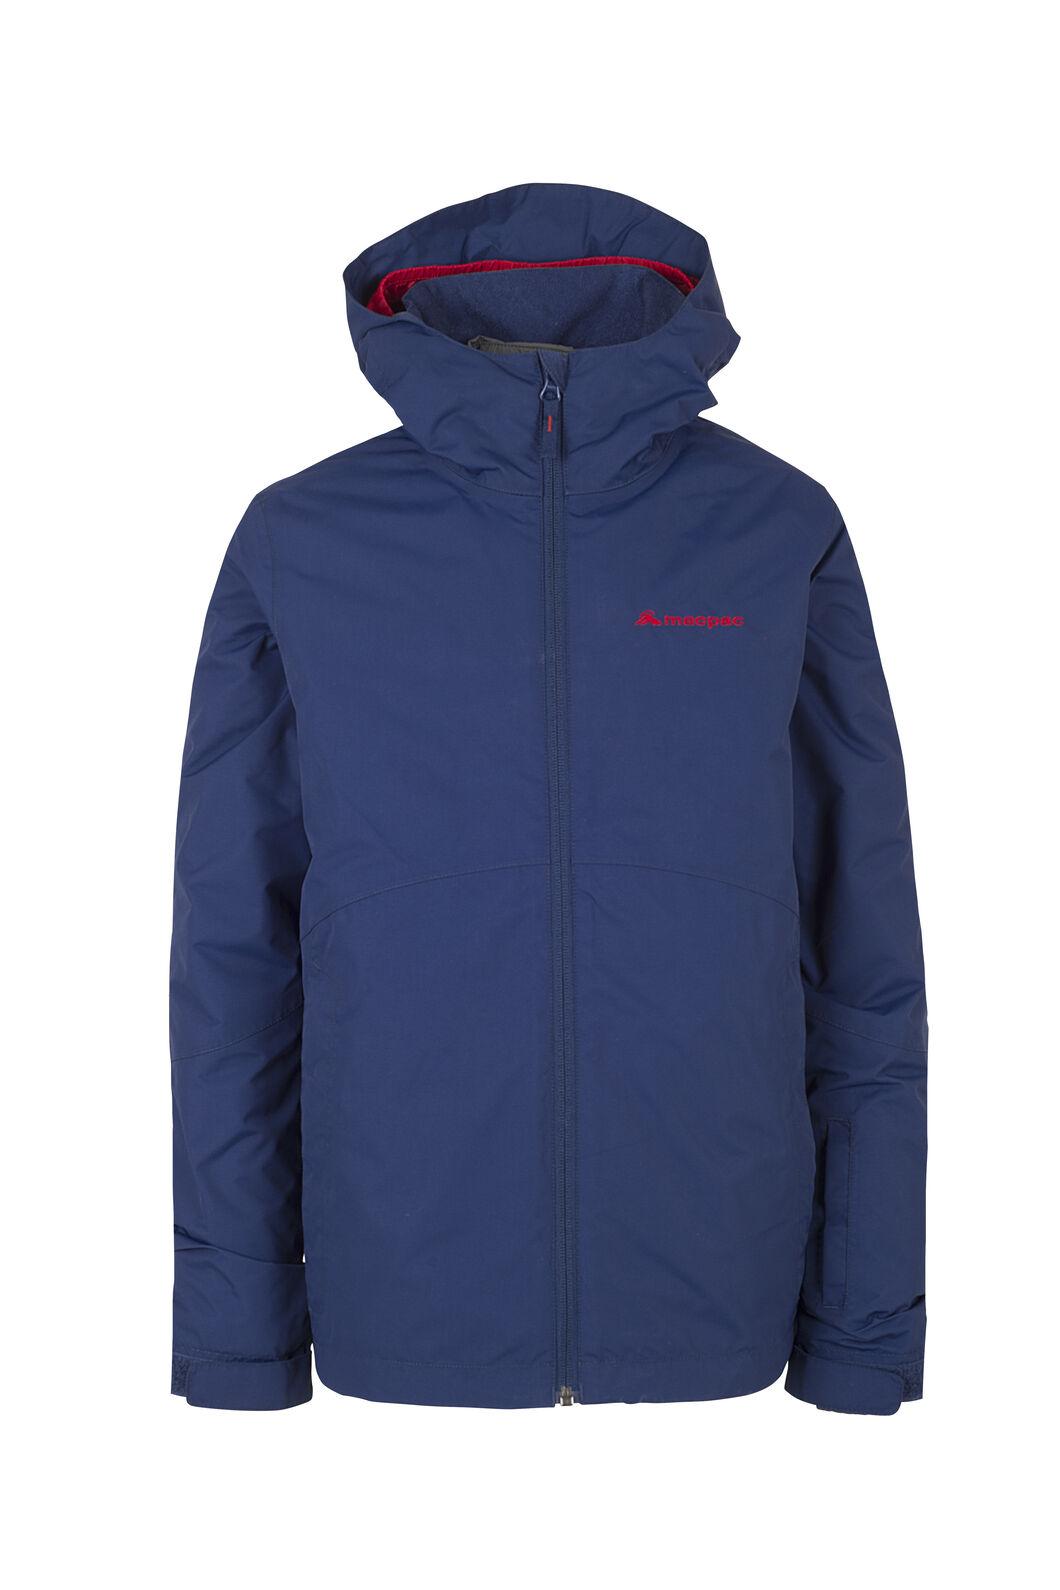 Macpac Snowdrift 3-in-1 Ski Jacket, Medieval Blue, hi-res